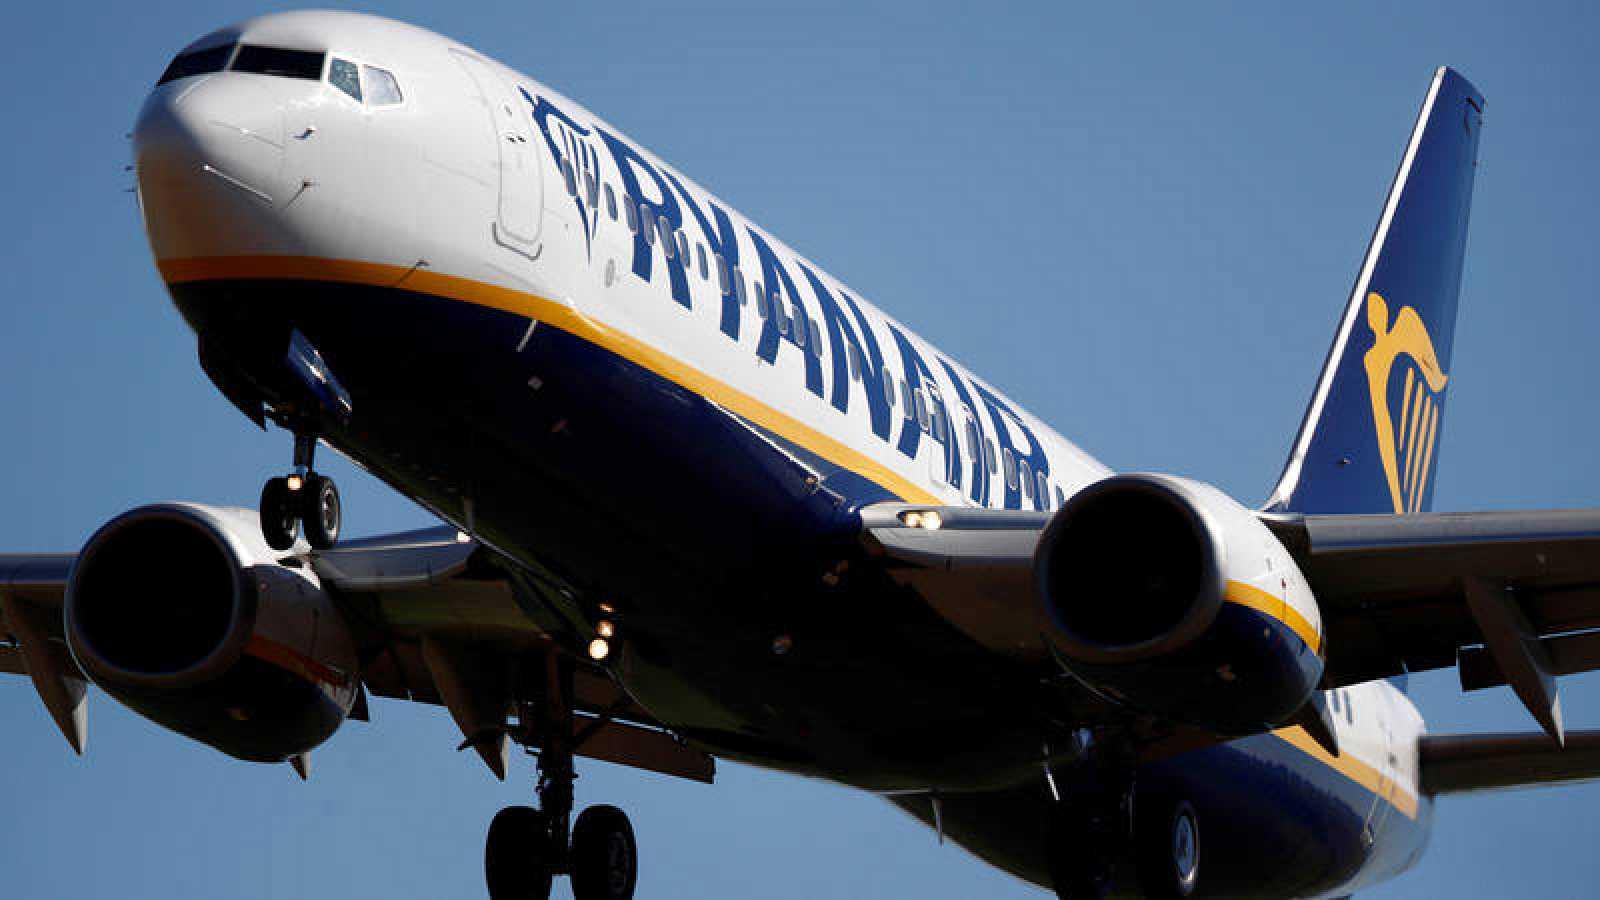 Un Boeing 737 operado por Ryanair aterriza en Tille, Francia